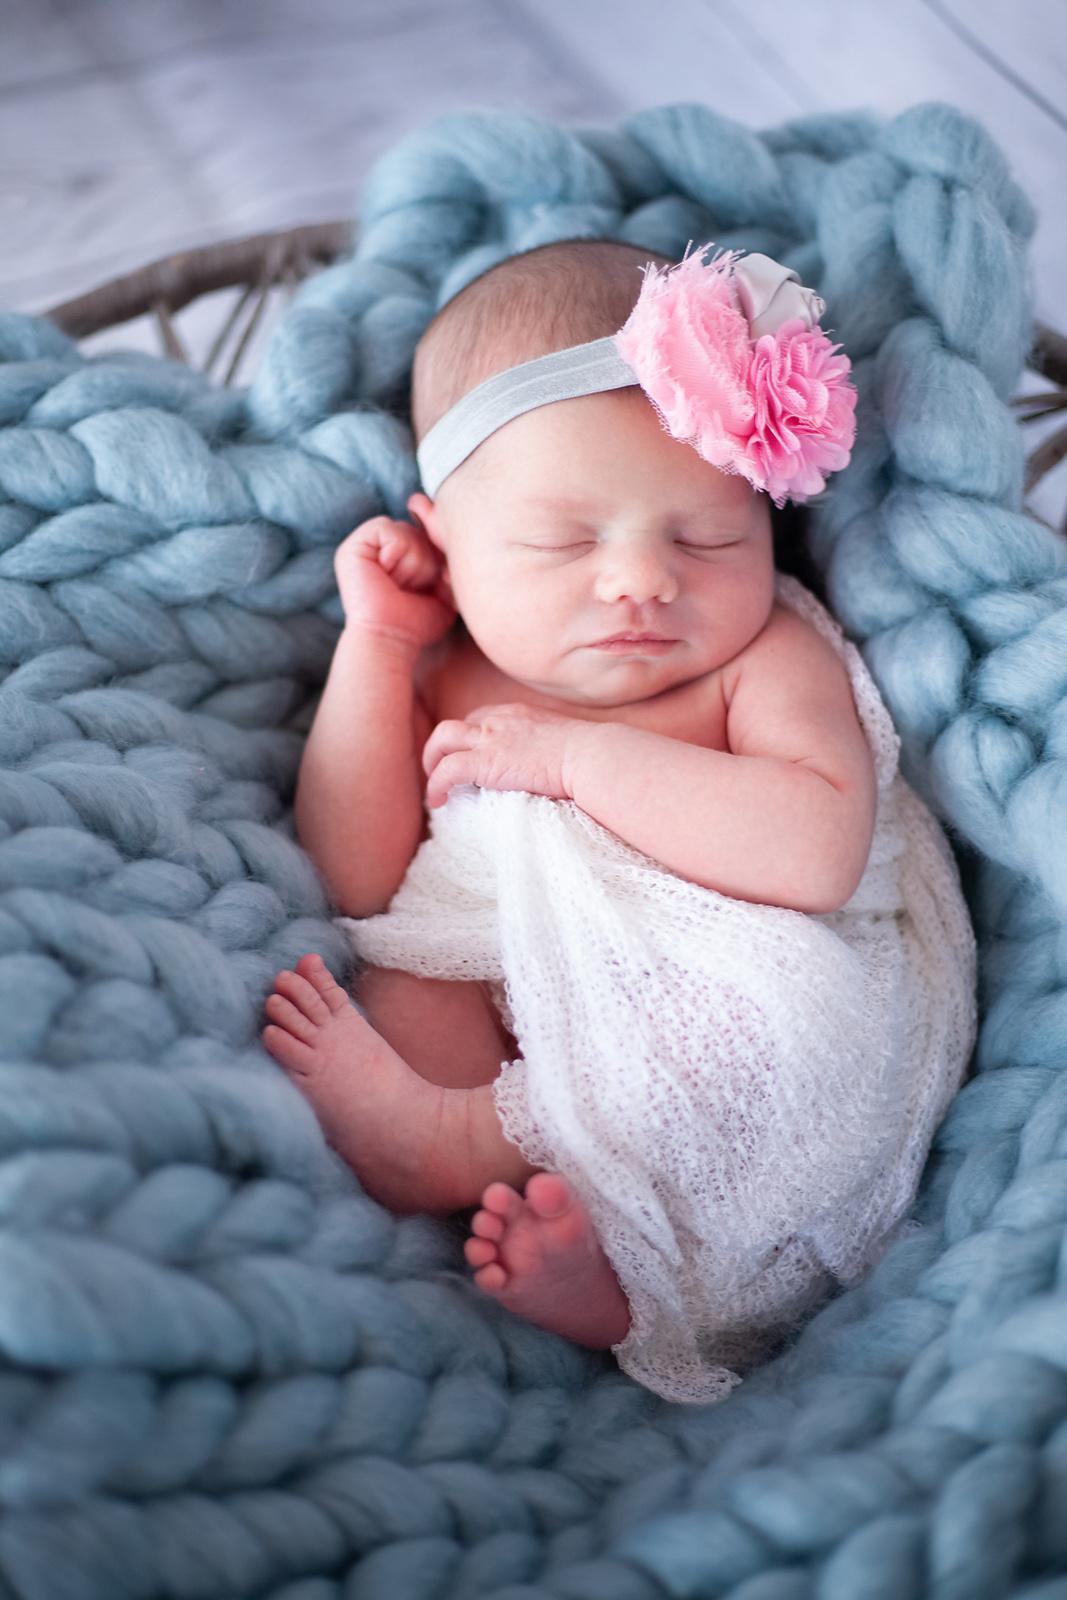 029-newborn-maternity-birth-family-photographer-acton-ma-107